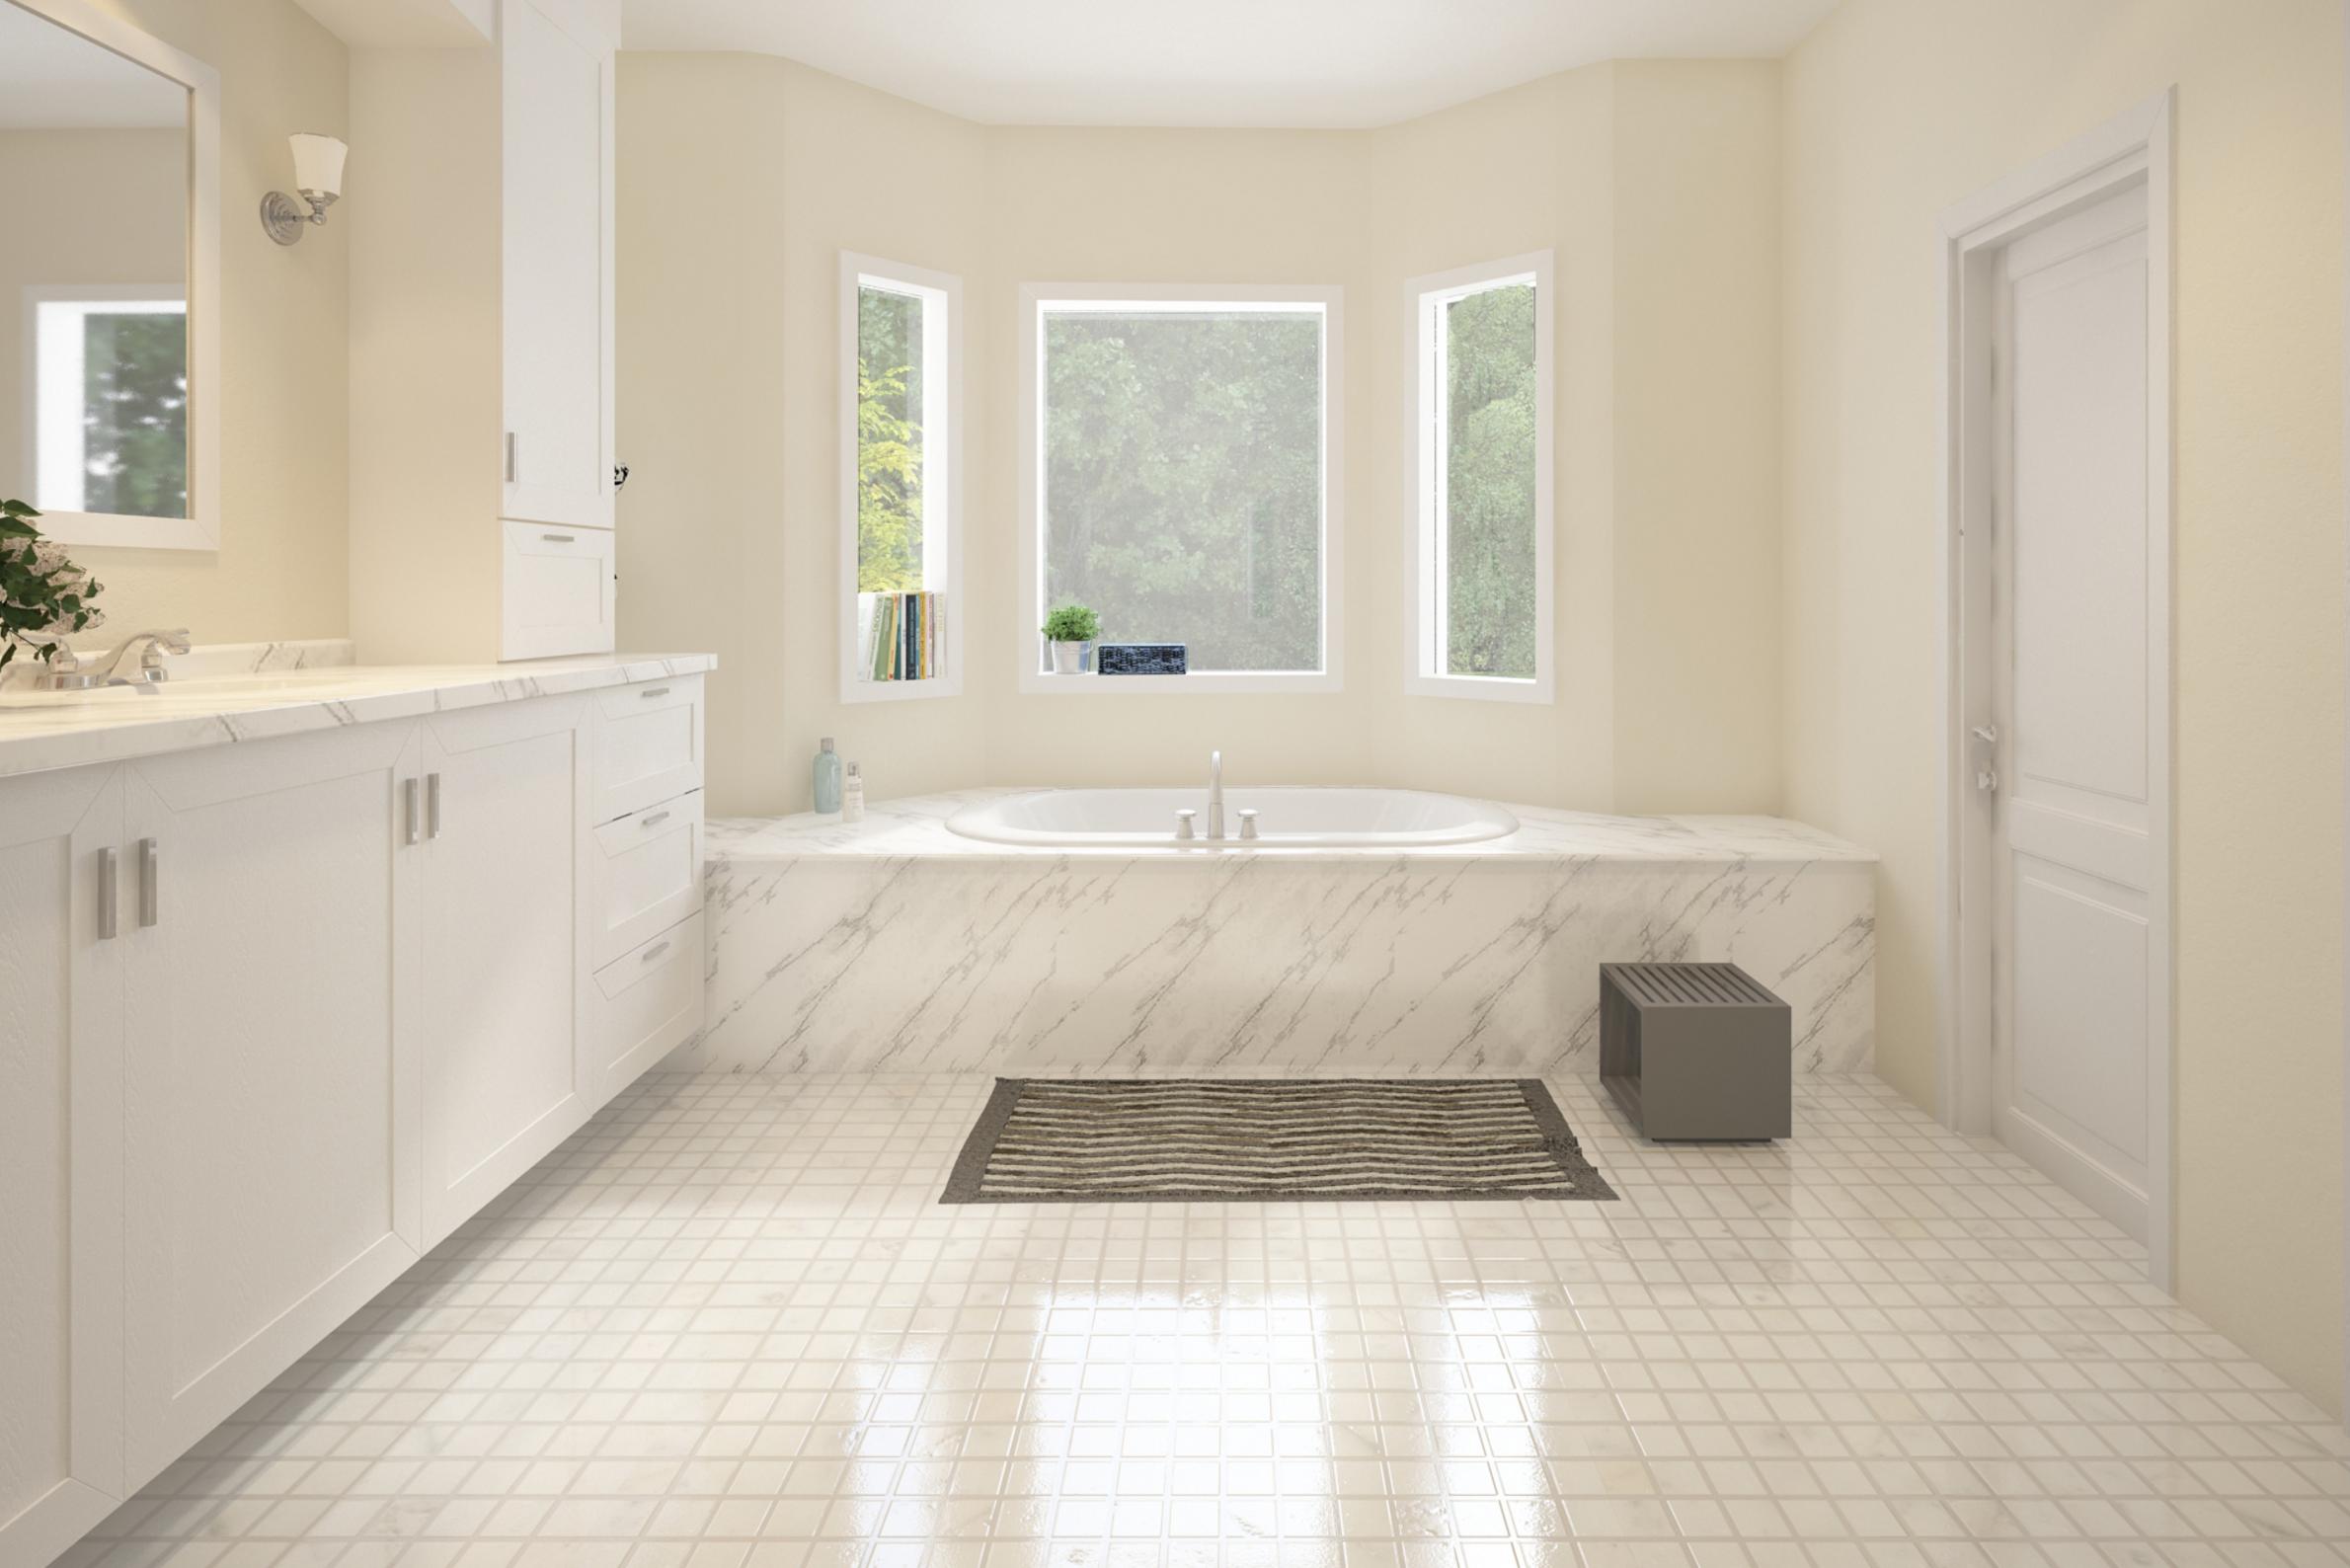 West Vancouver Bathroom Renovation Design